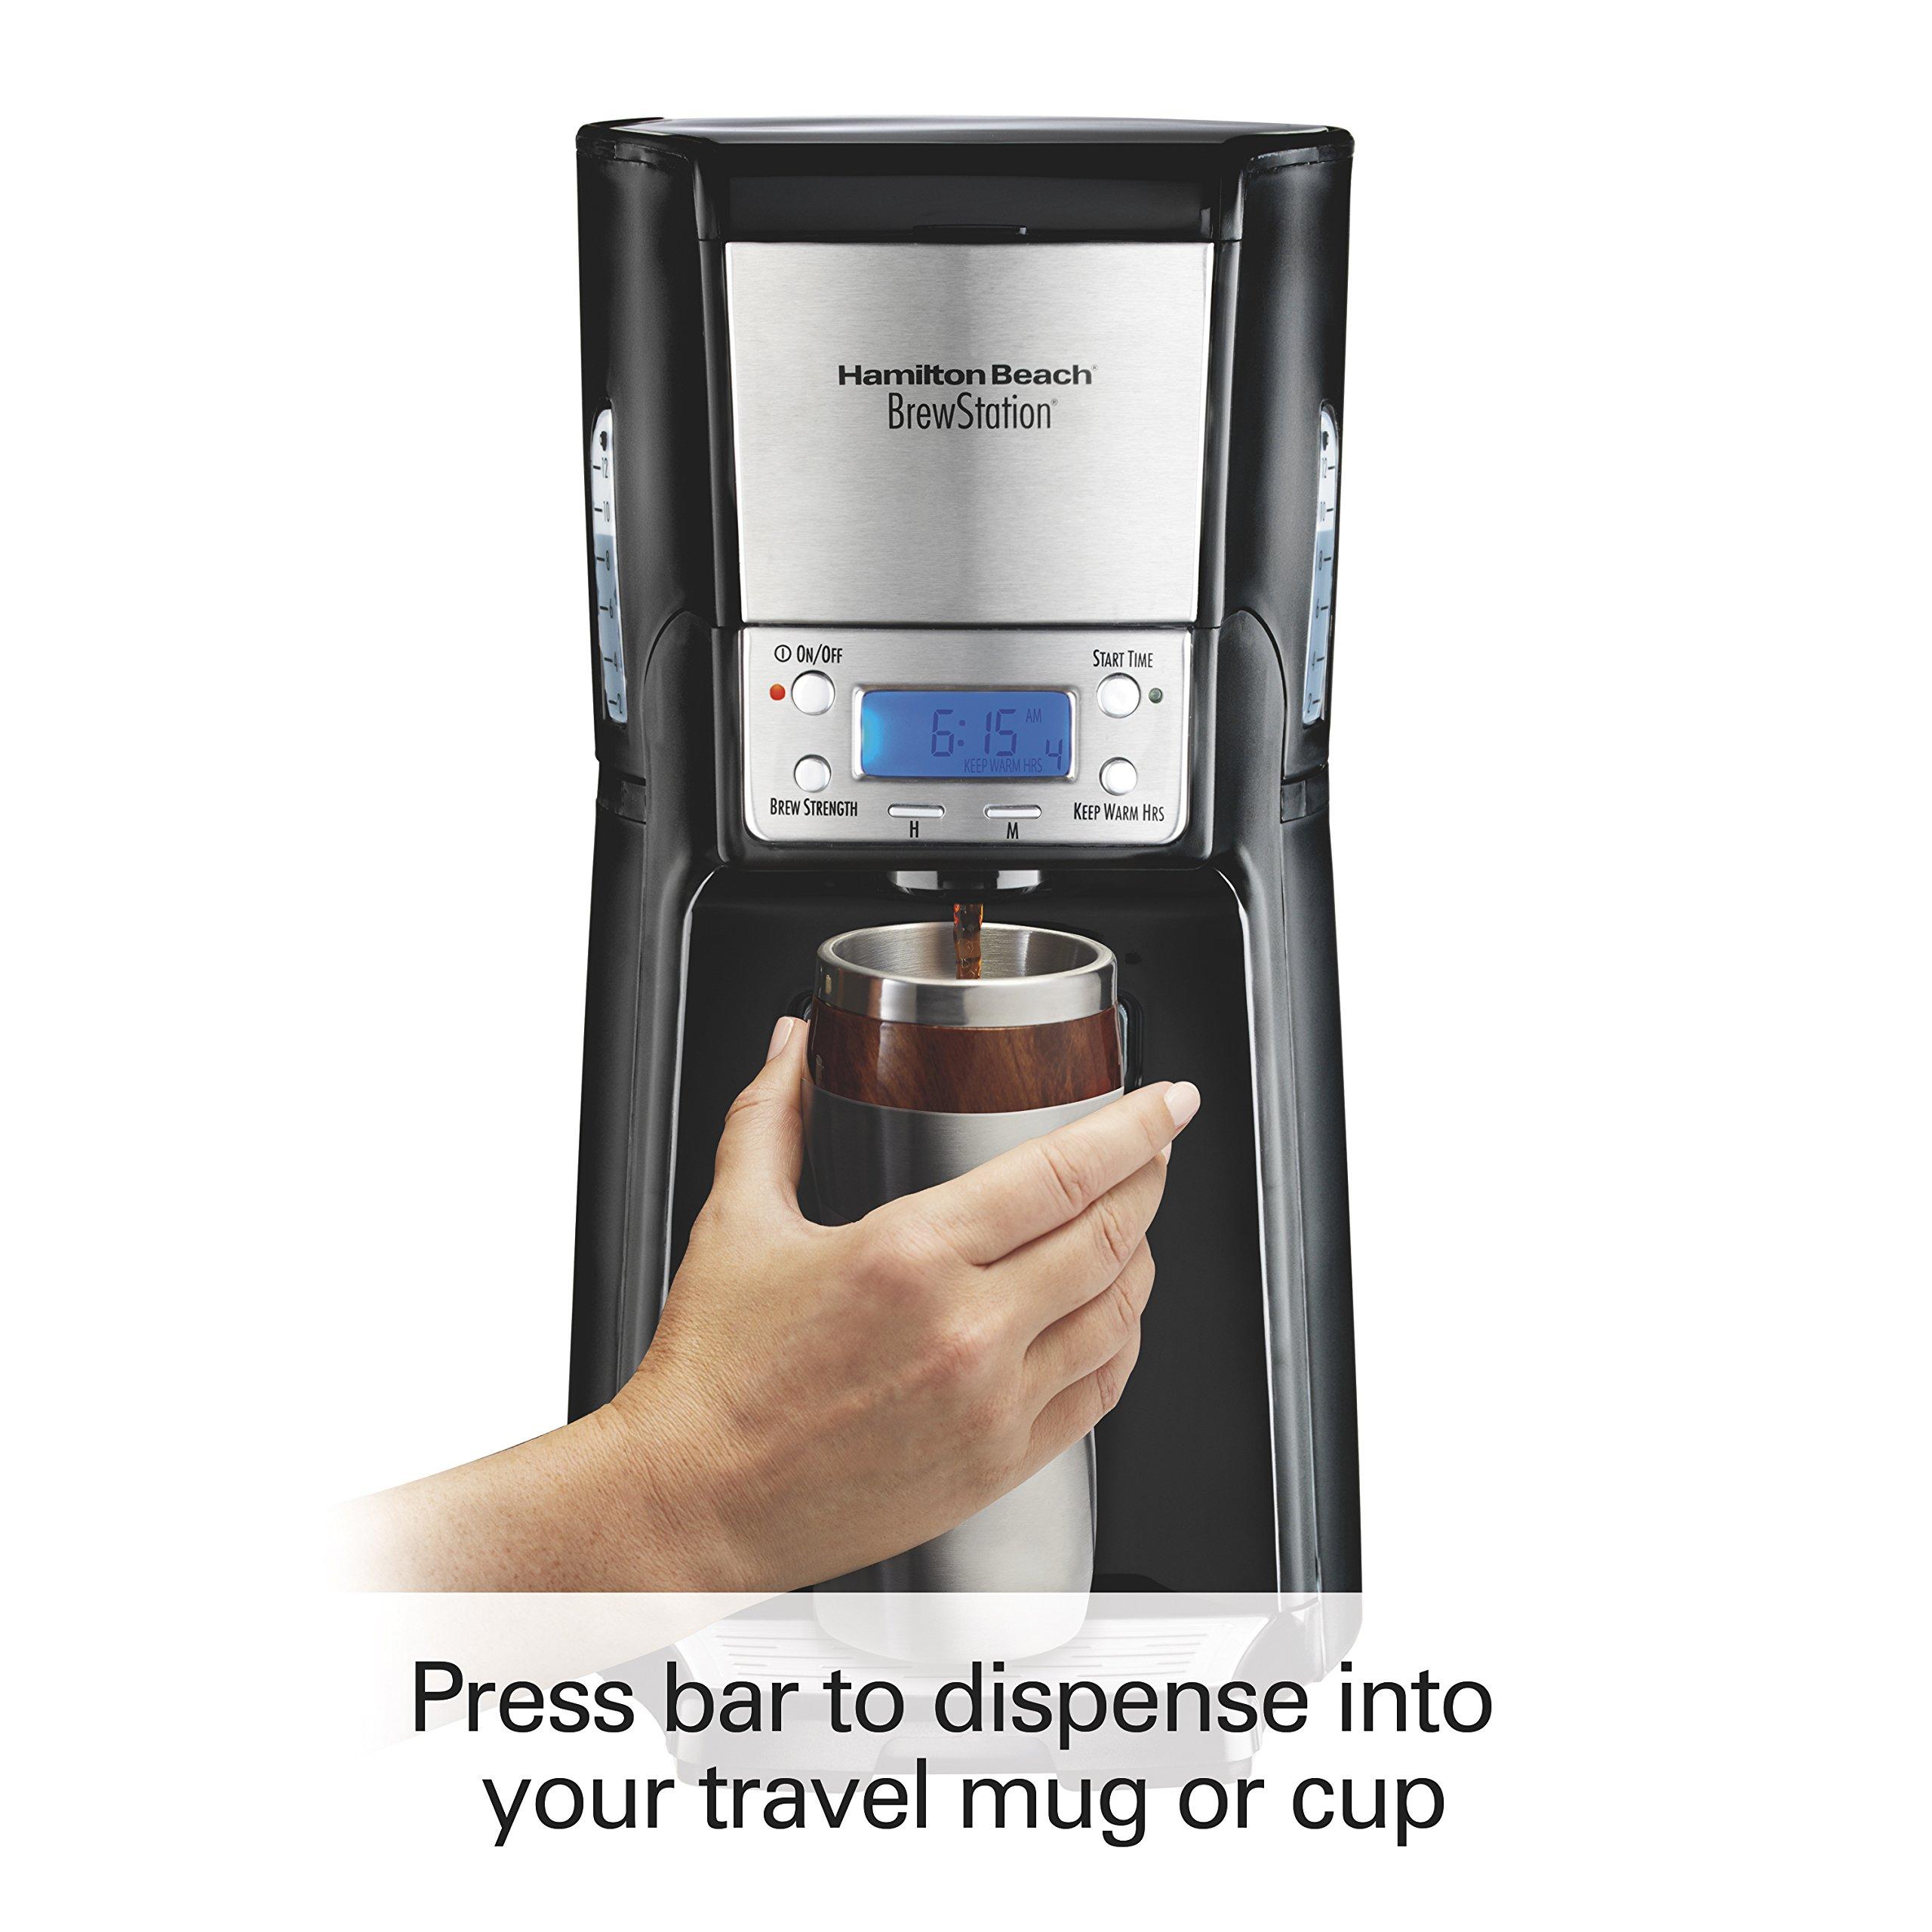 Hamilton Beach (48464) Coffee Maker with 12 Cup Capacity & Internal Storage Coffee Pot, Brewstation, Black by Hamilton Beach (Image #4)